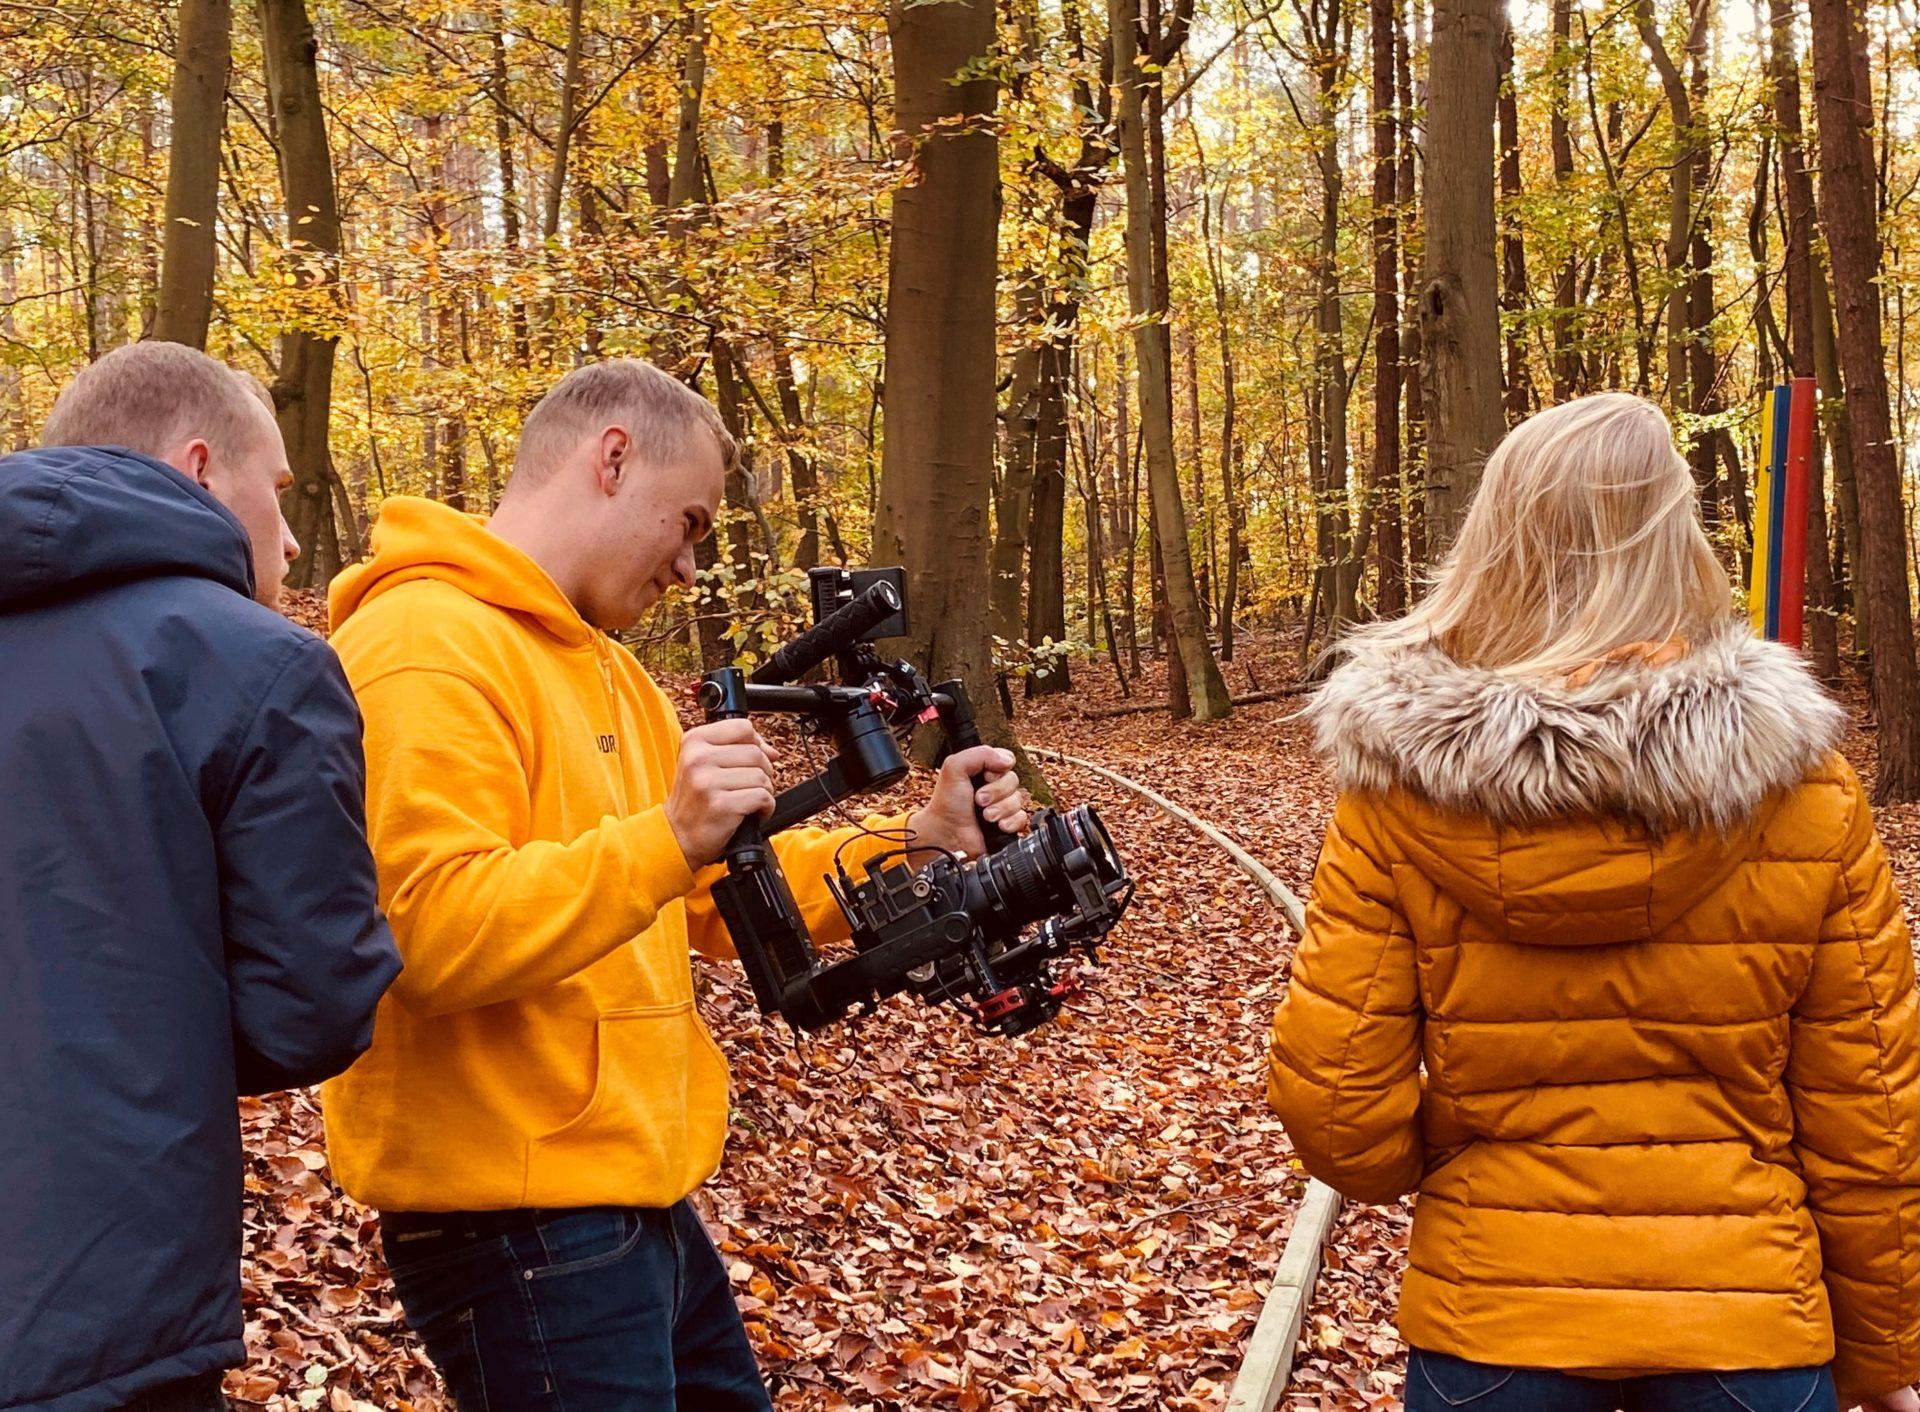 Behind The Scences im Wald | Kaiserbäder Usedom